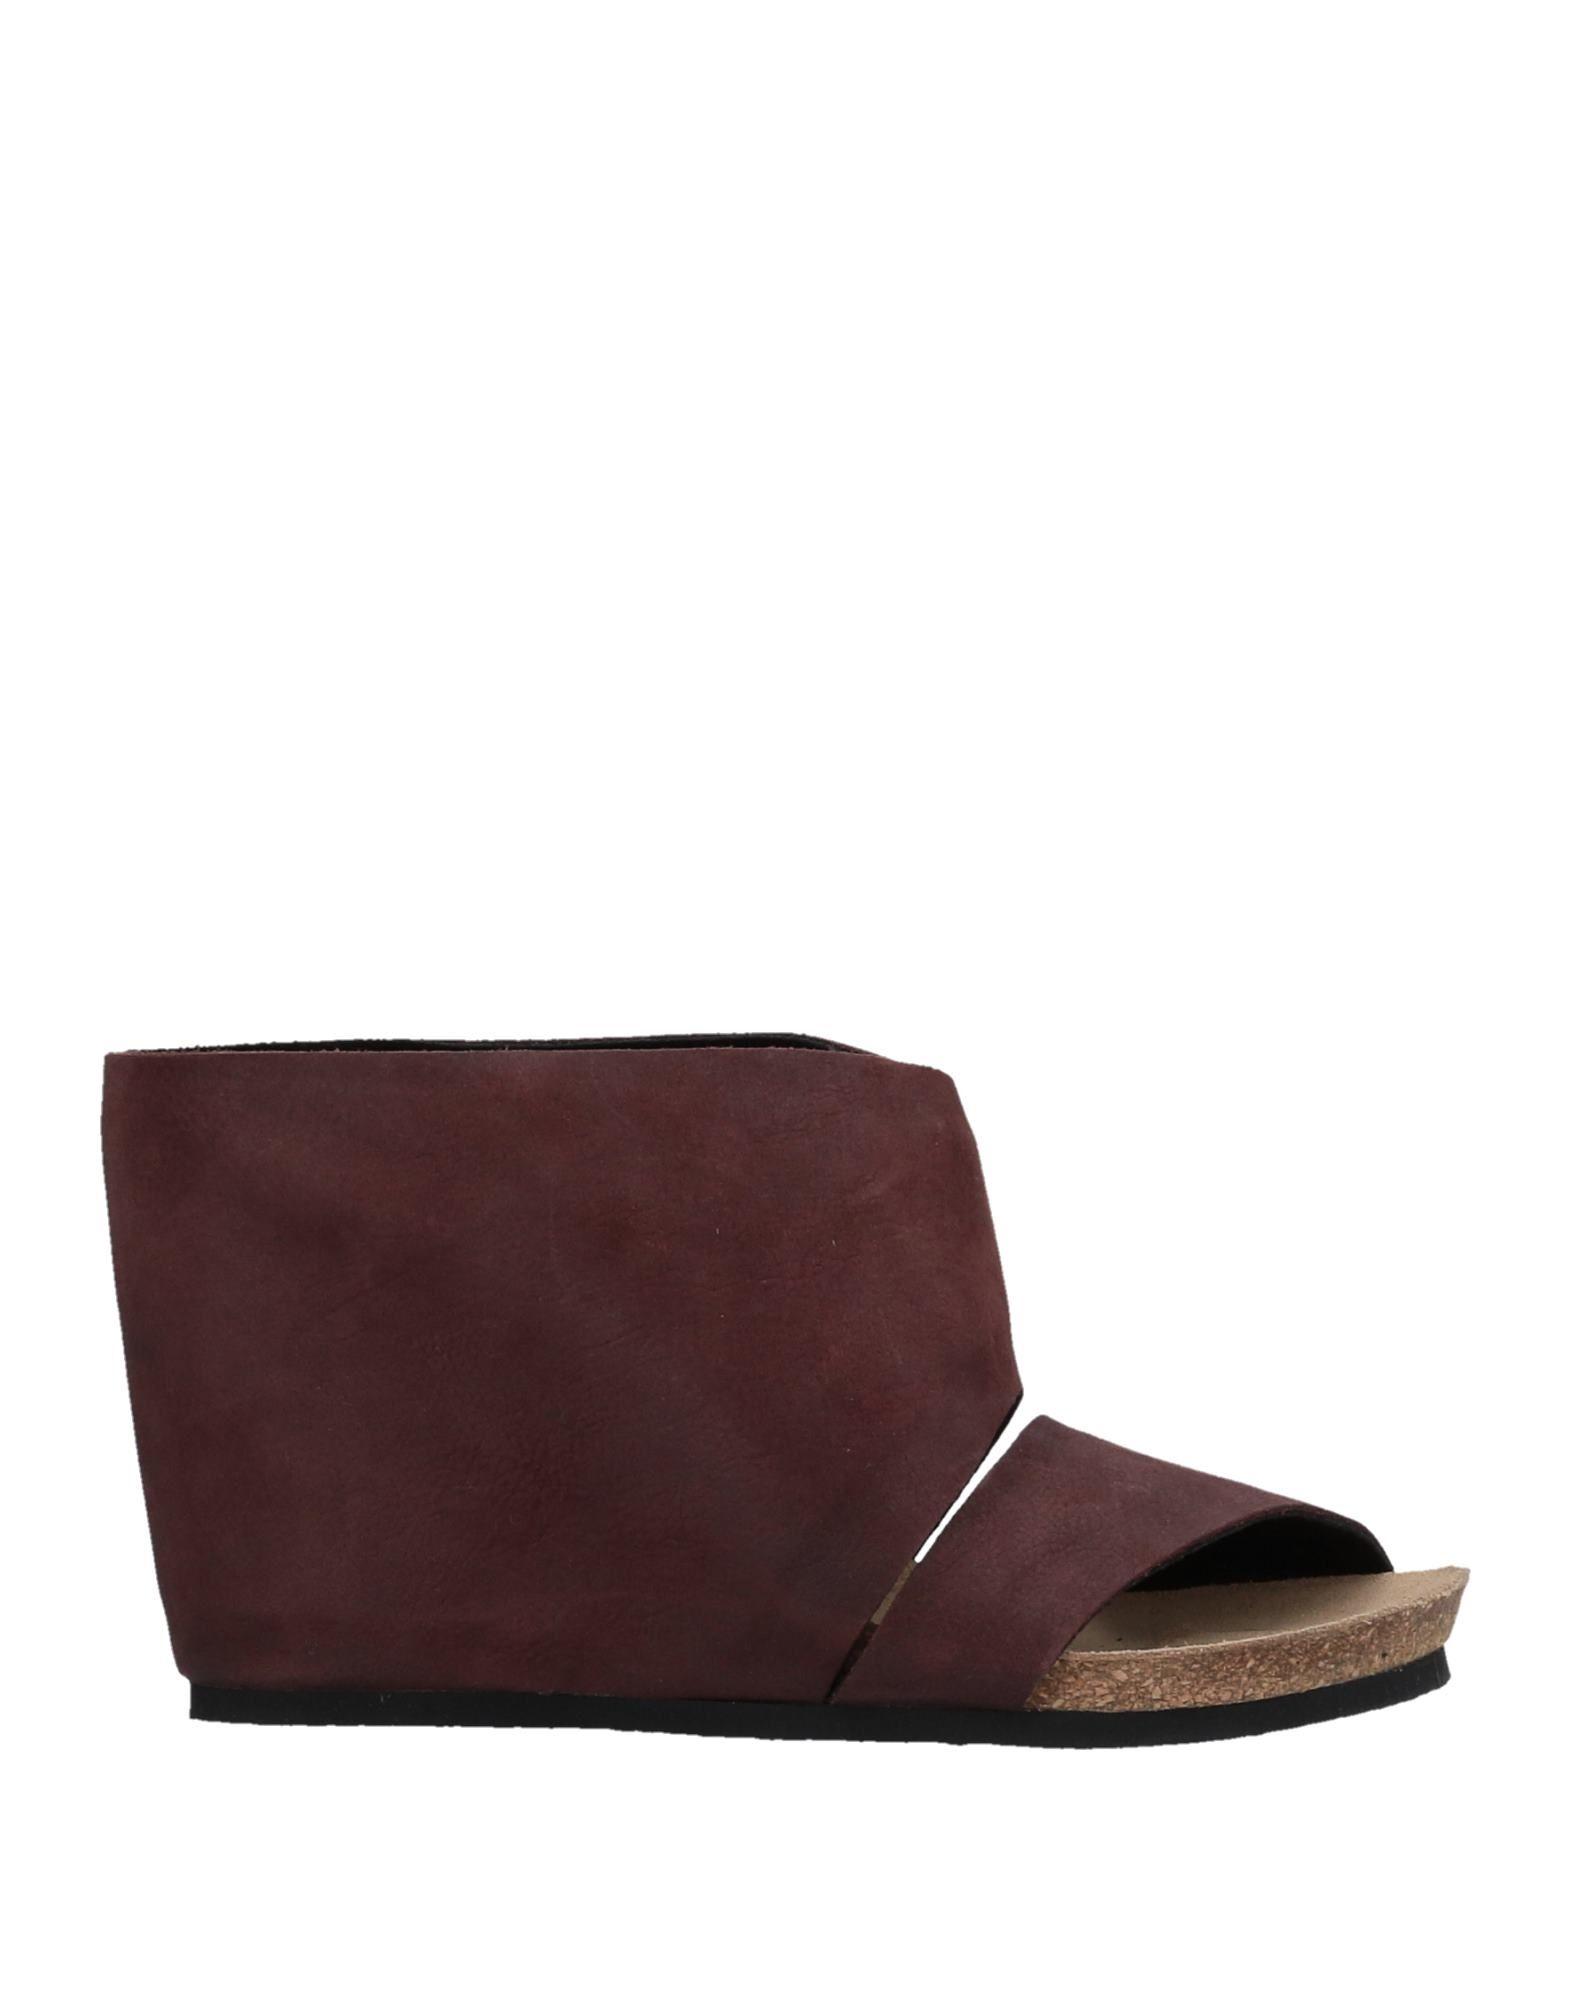 Stilvolle billige Schuhe Damen Peter Non Sandalen Damen Schuhe  11111544DJ c9e3fa